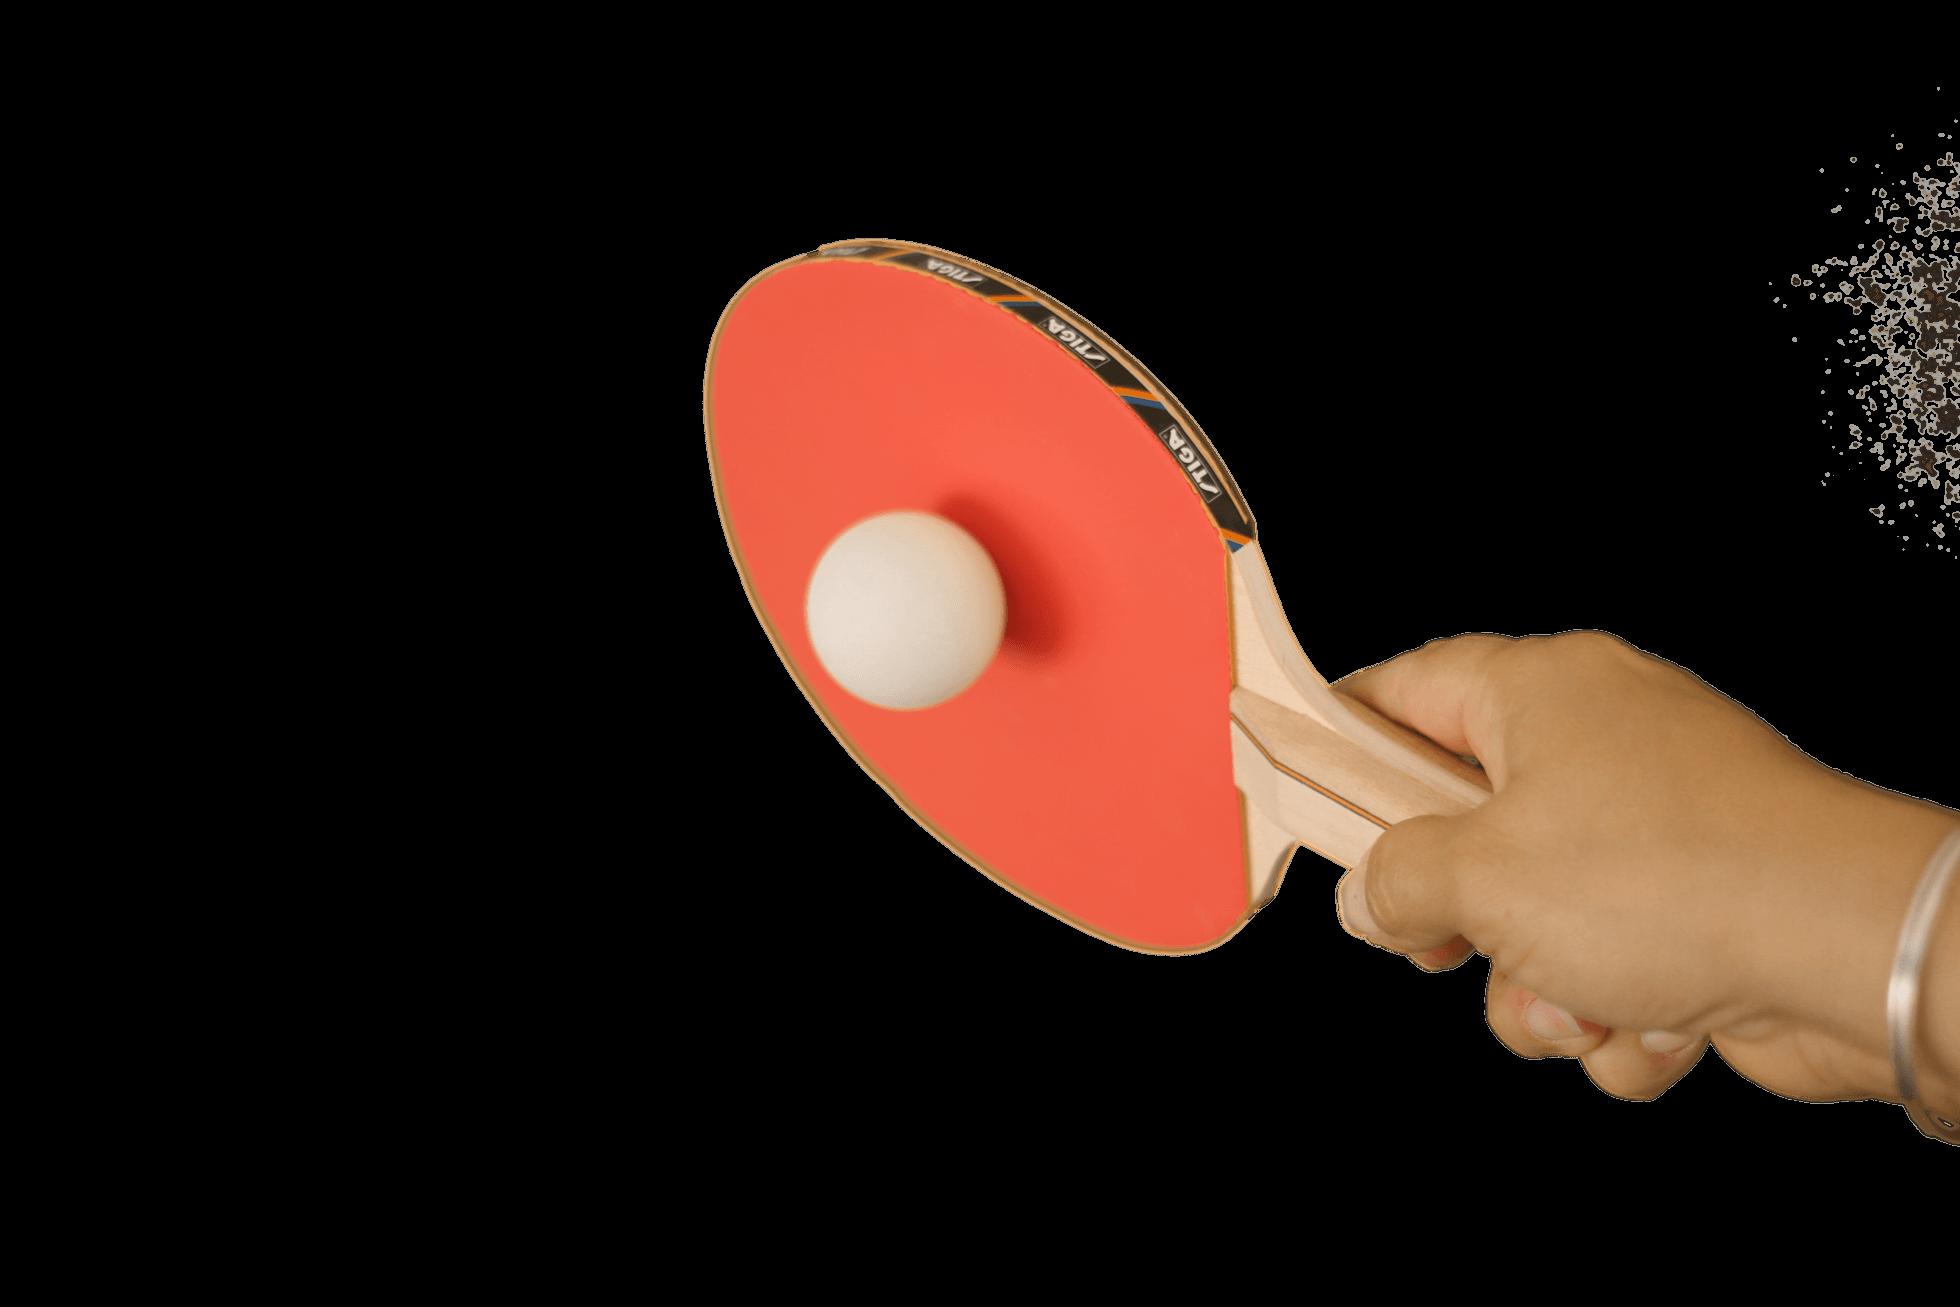 Playing transparent png stickpng. Clipart bat ping pong